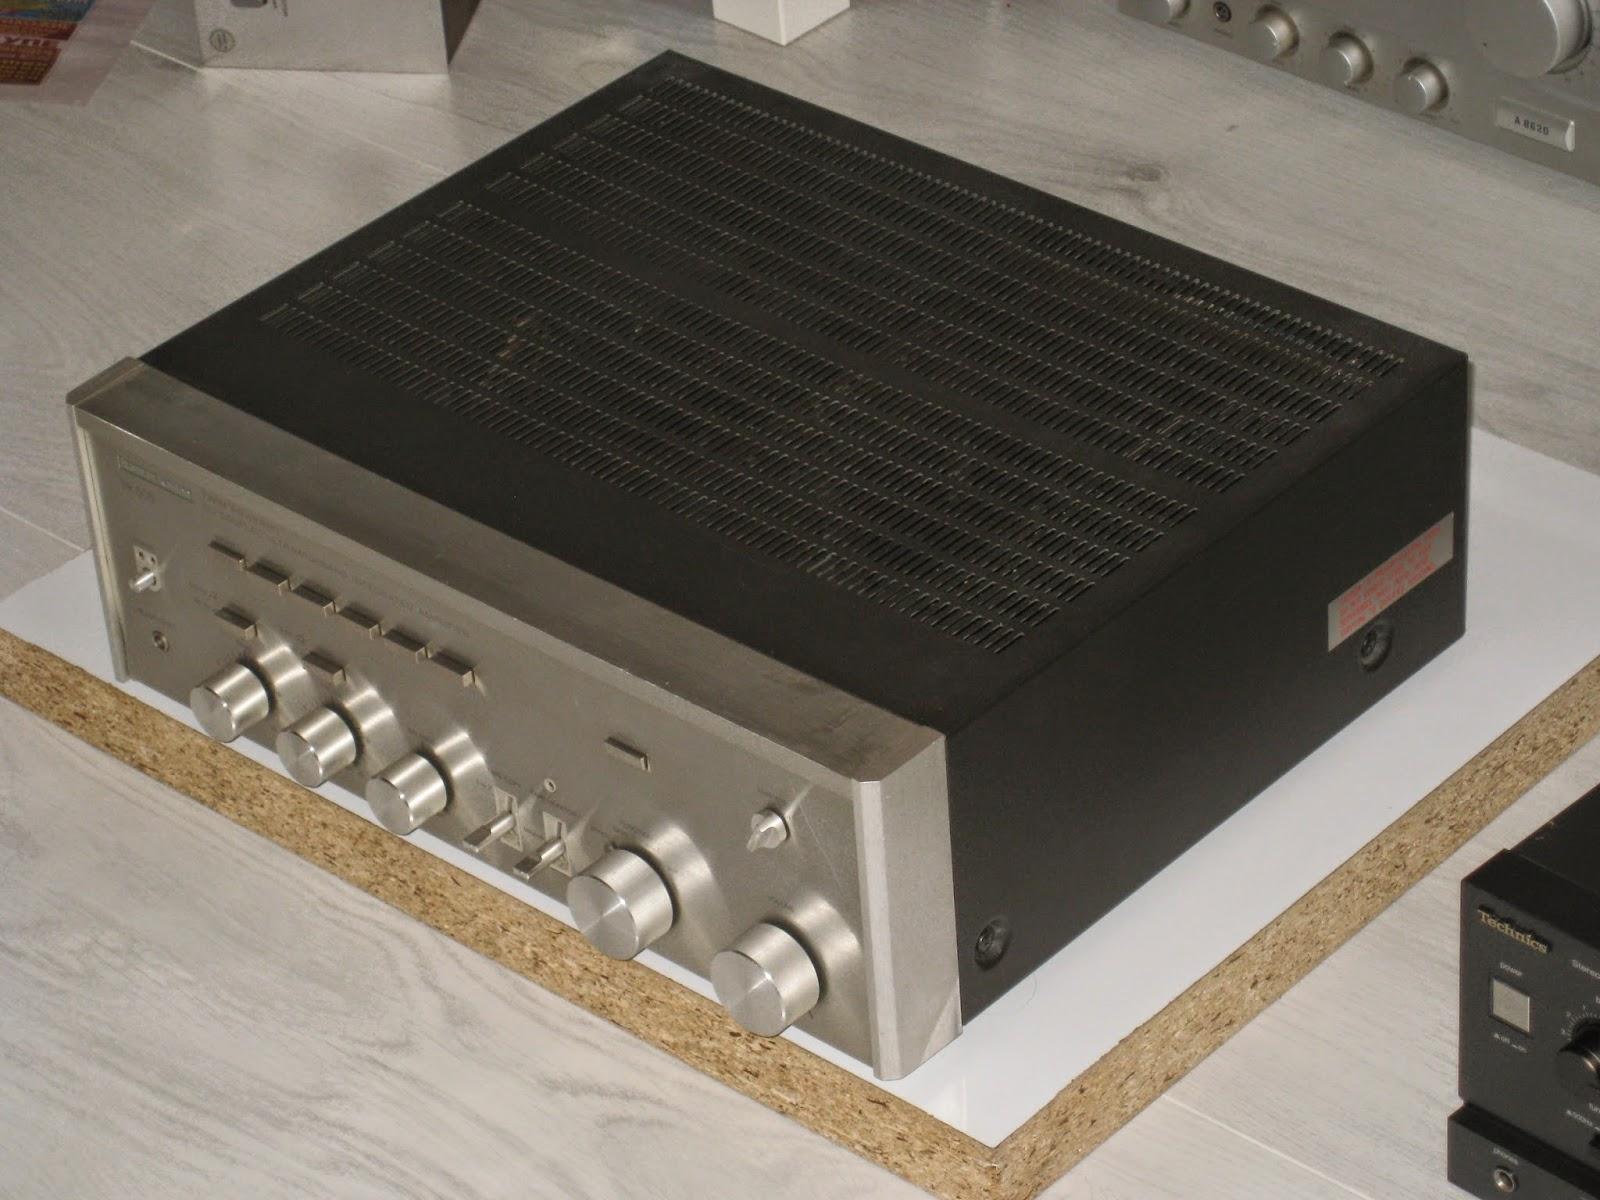 Infrequent Sound Sextex Technology Harman Kardon Hk 505 Twin Dc Coupled Audio Amplifier Ultra Wideband Integrated 2026